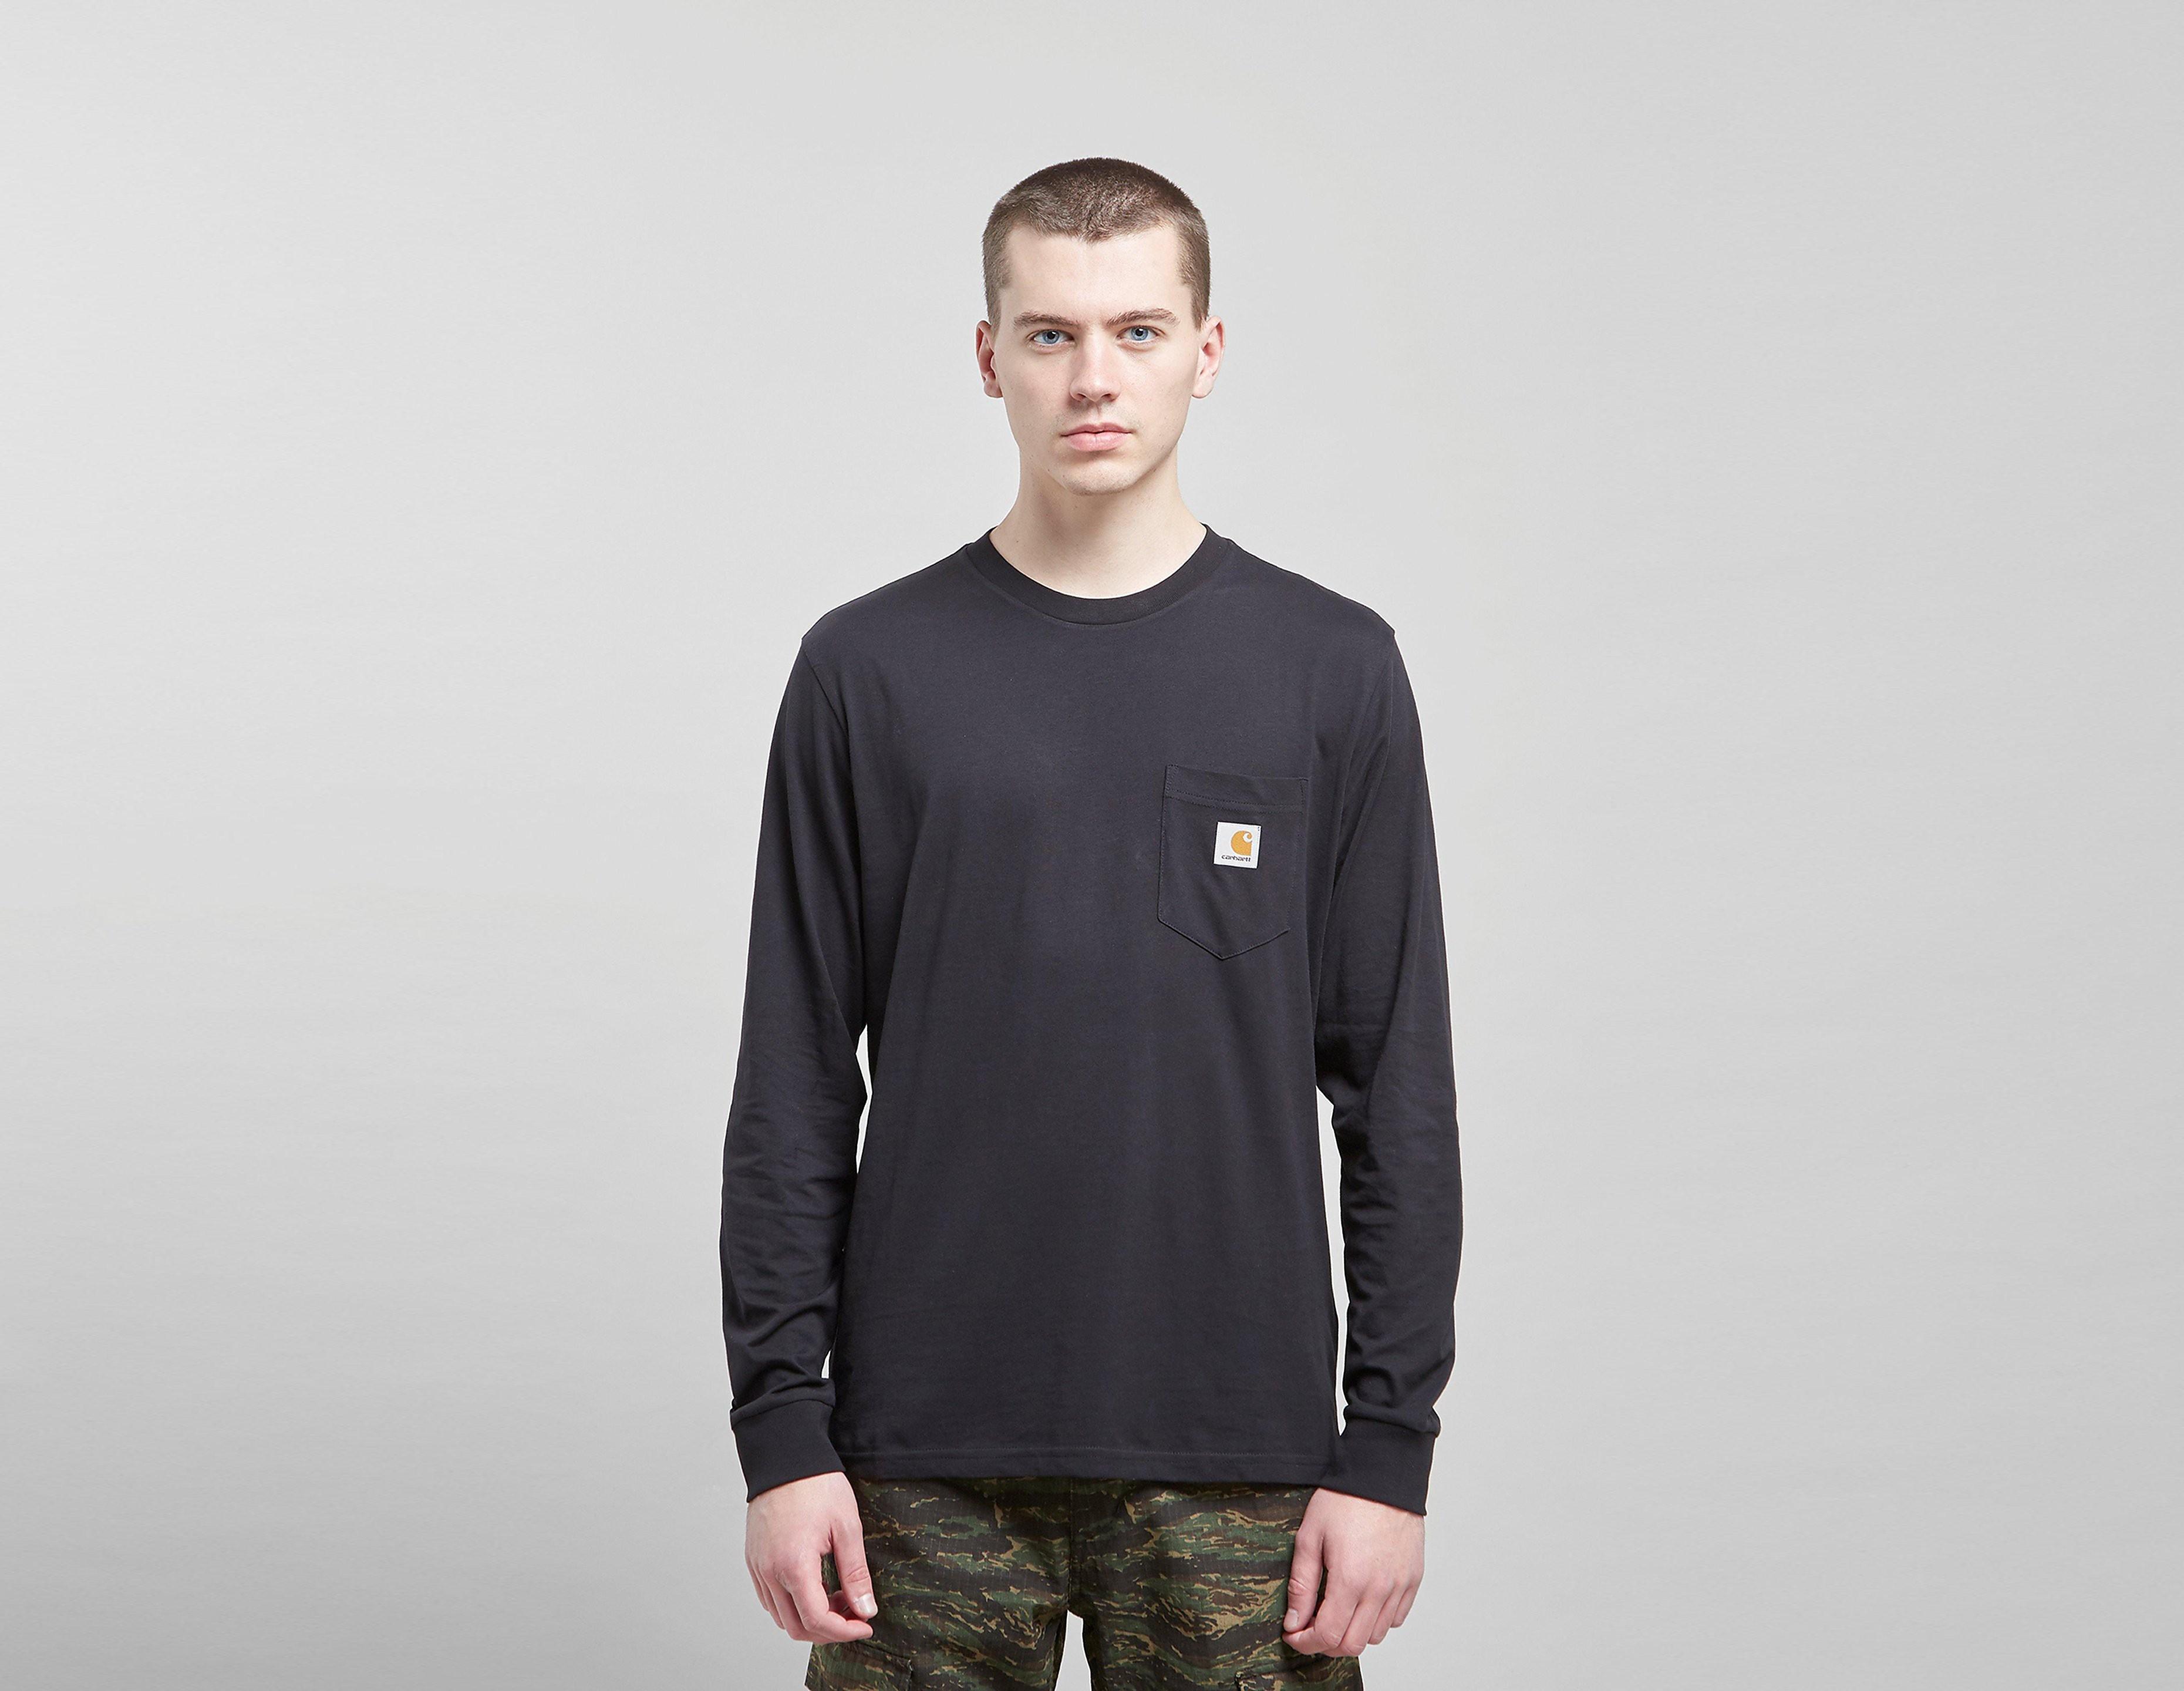 Carhartt WIP Long-Sleeved Pocket T-Shirt